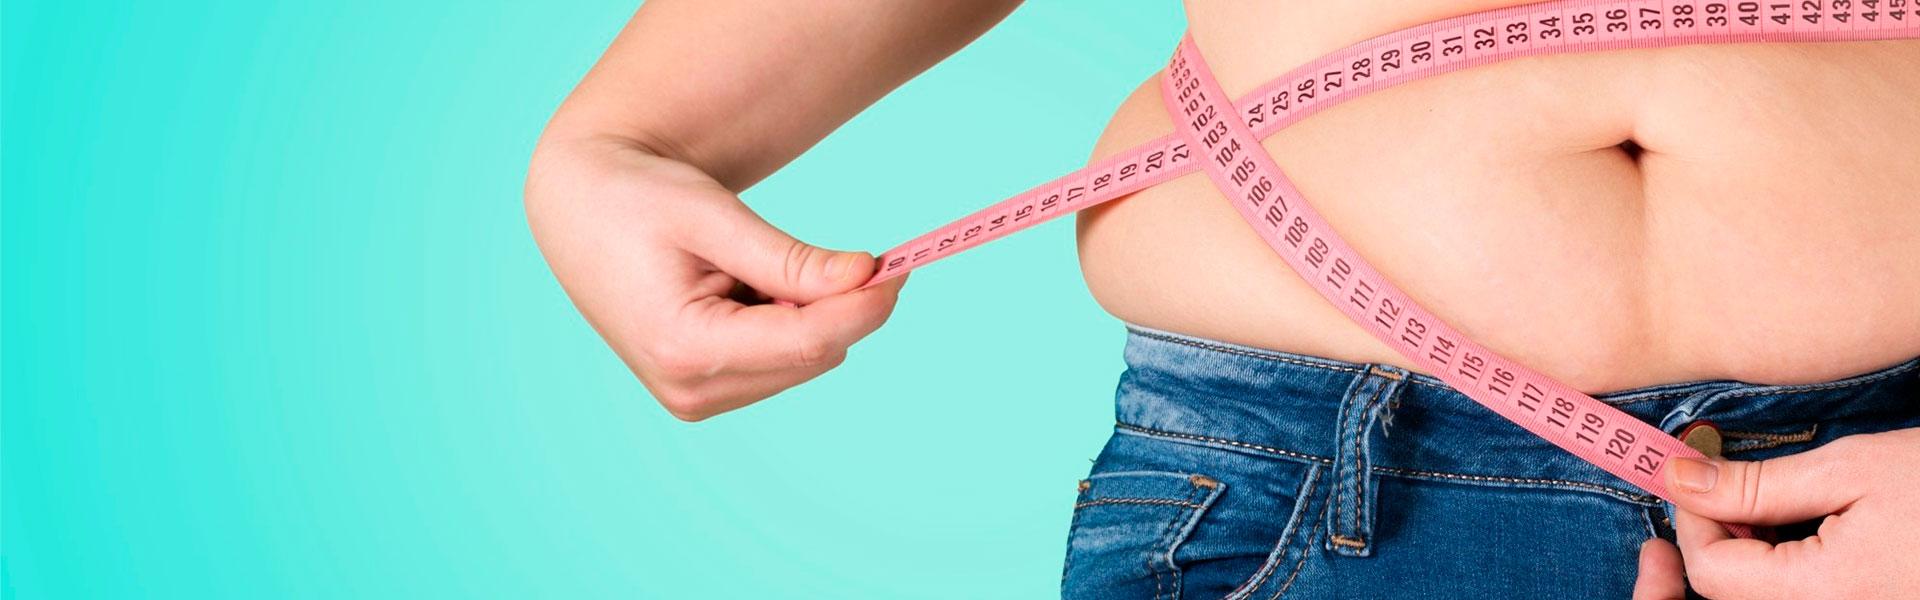 eficacia-cirugia-obesidad